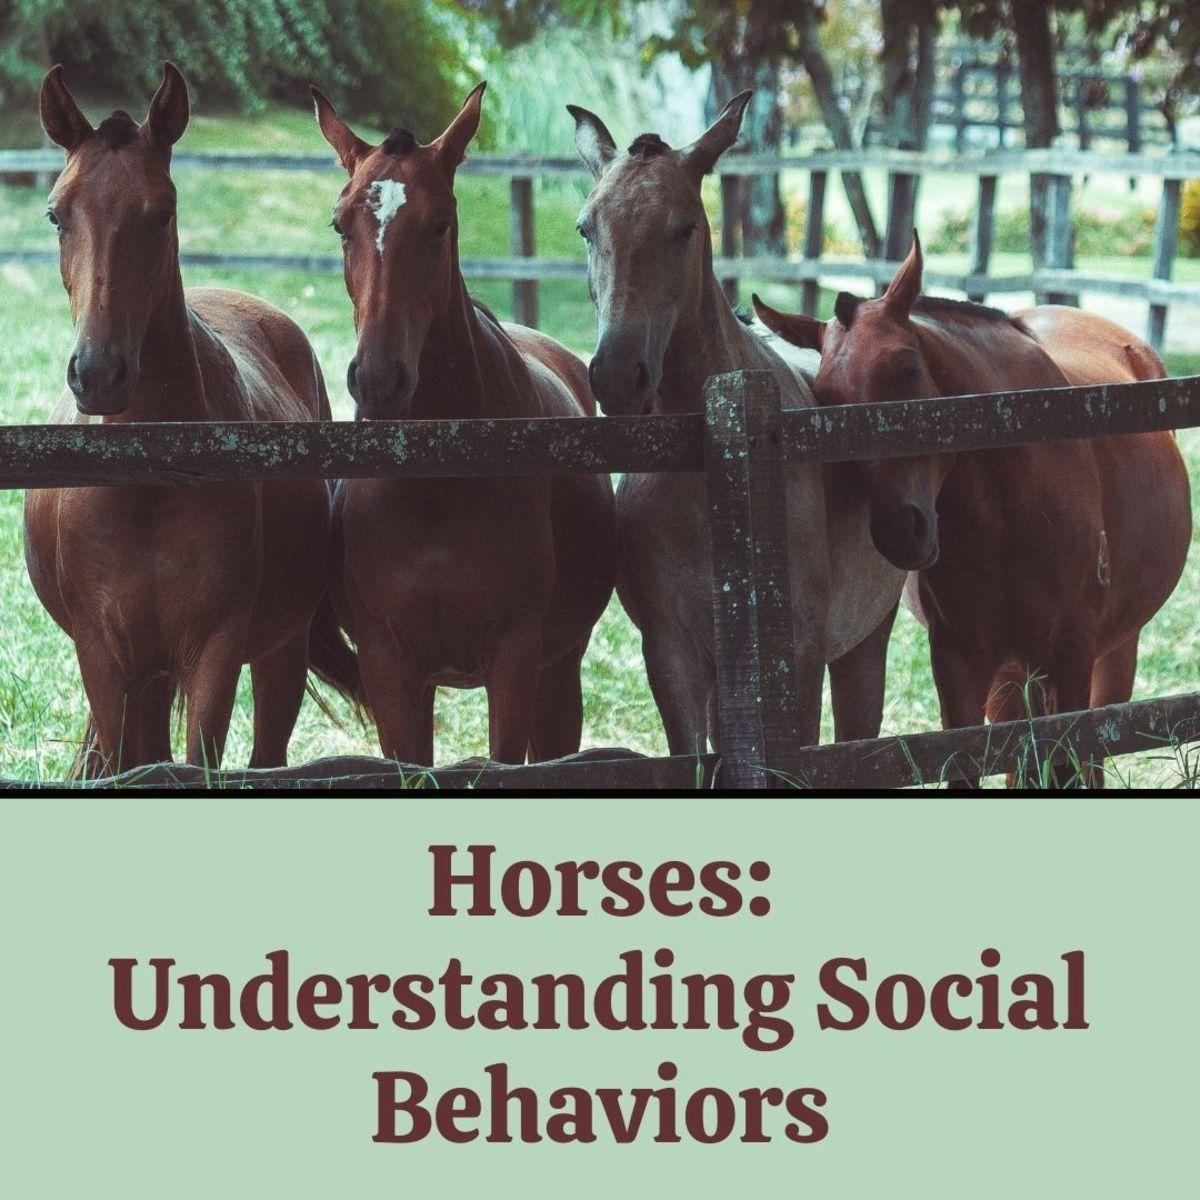 Social Behaviors of Wild and Domestic Horses